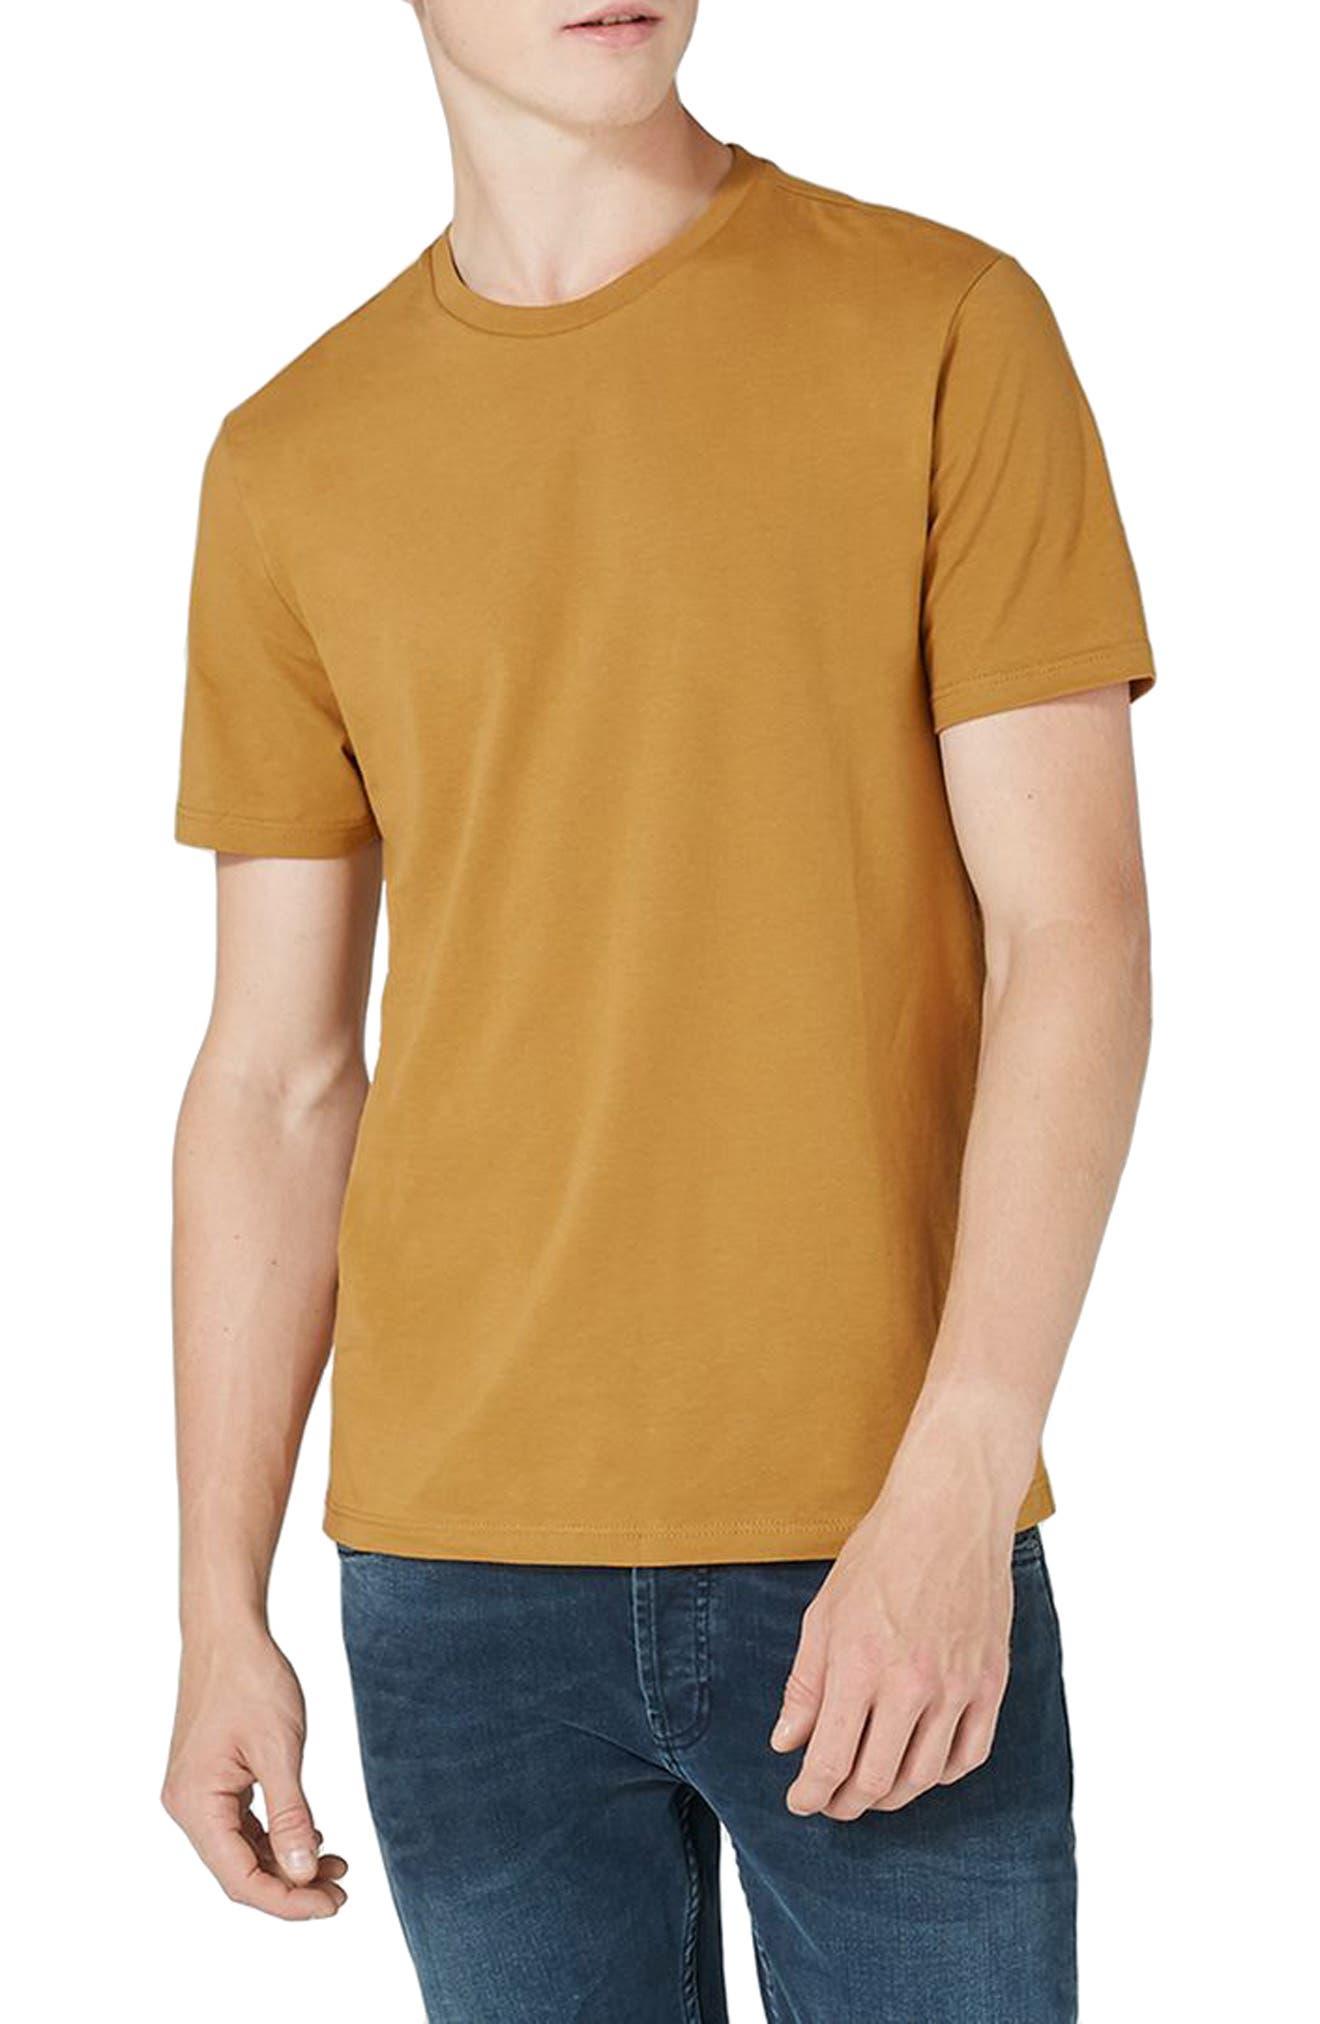 TOPMAN Slim Fit Crewneck T-Shirt, Main, color, 701